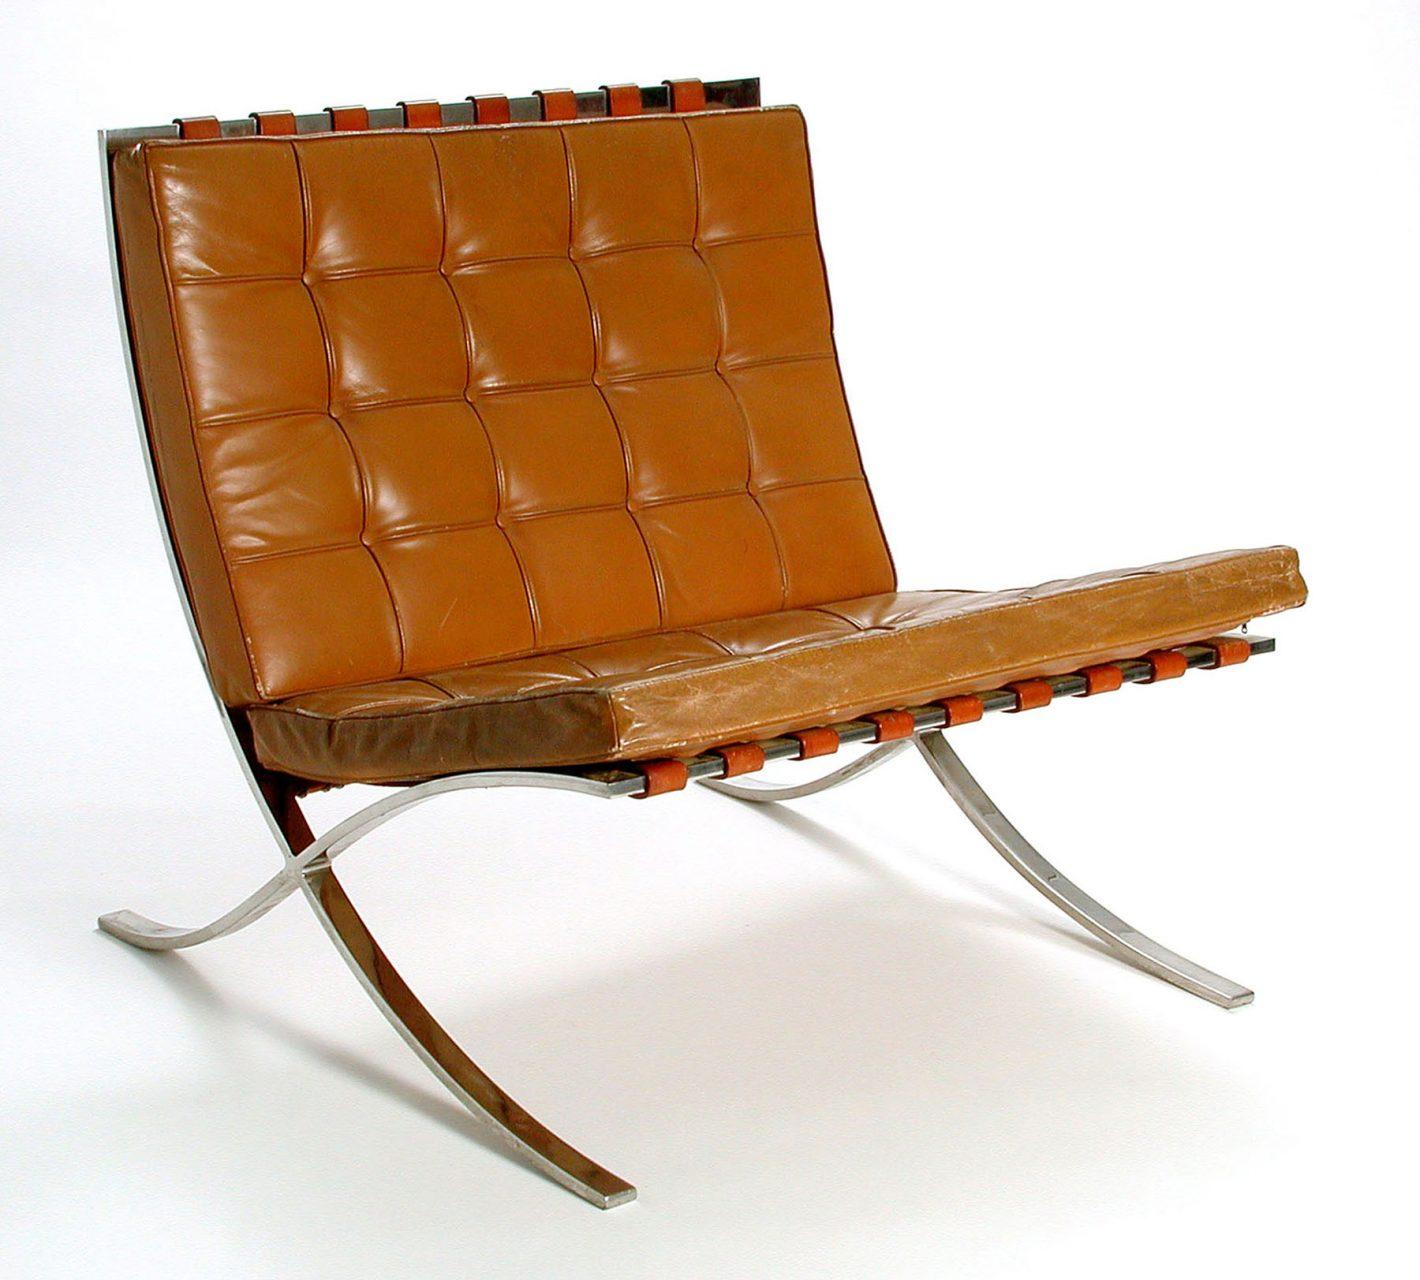 Ludwig Mies van der Rohe.  Barcelona Chair, 1929, Beispiel um 1960.